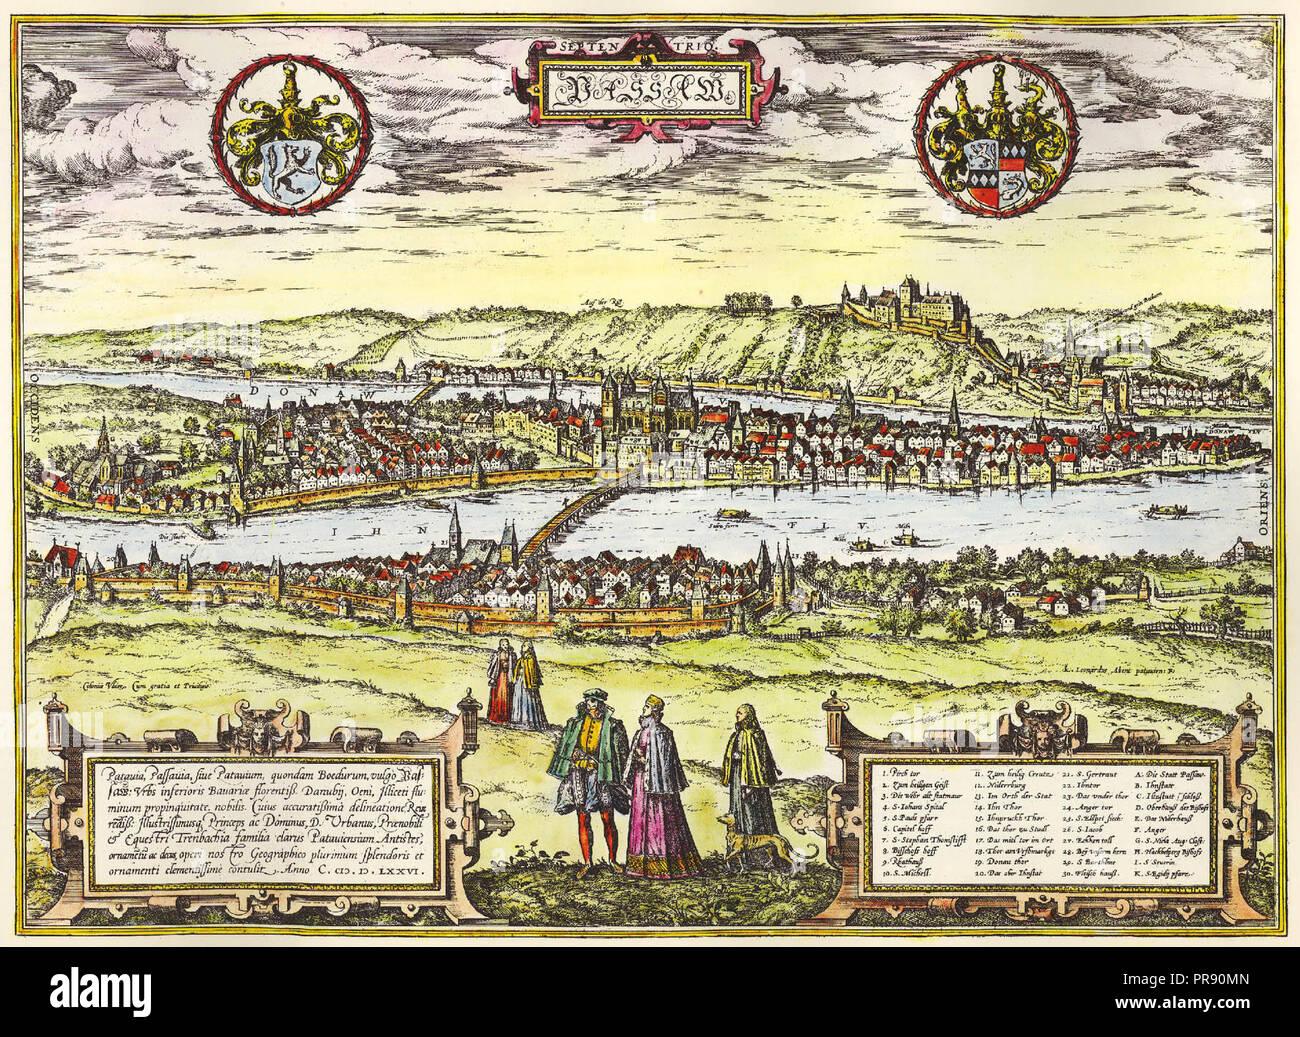 Passau C 1581 Stock Photo 220859653 Alamy